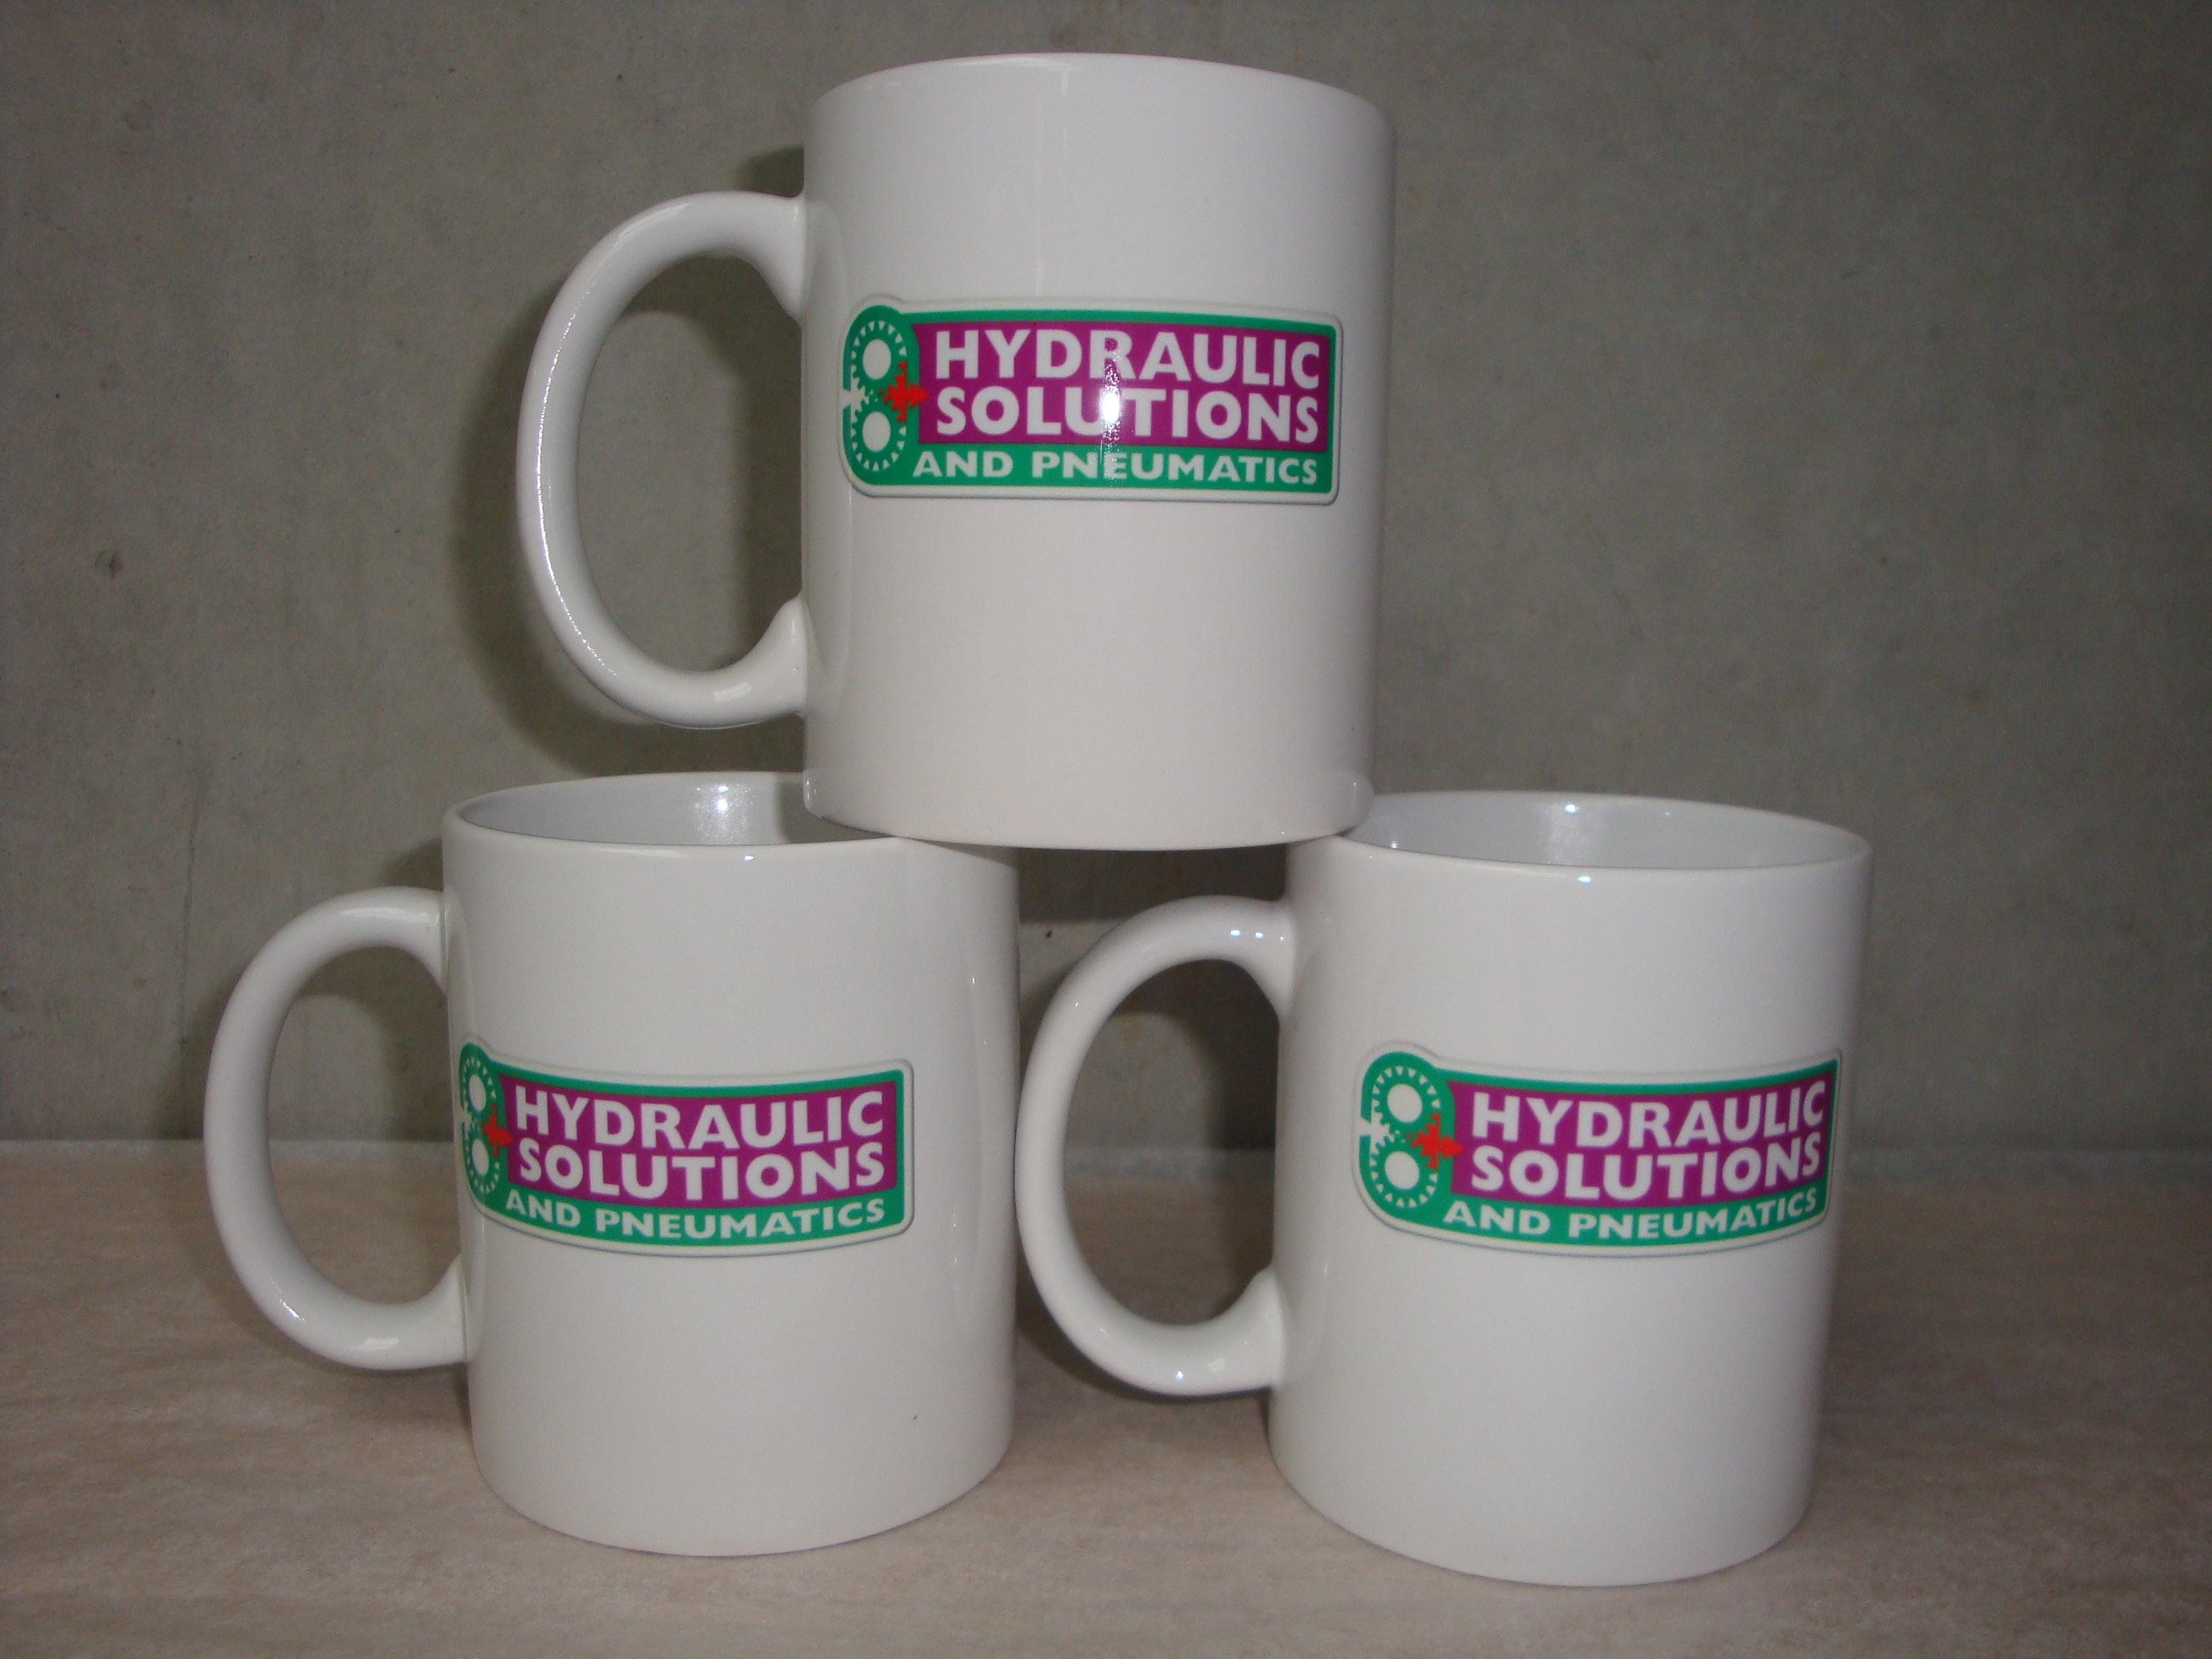 cheap mugs printed with logos